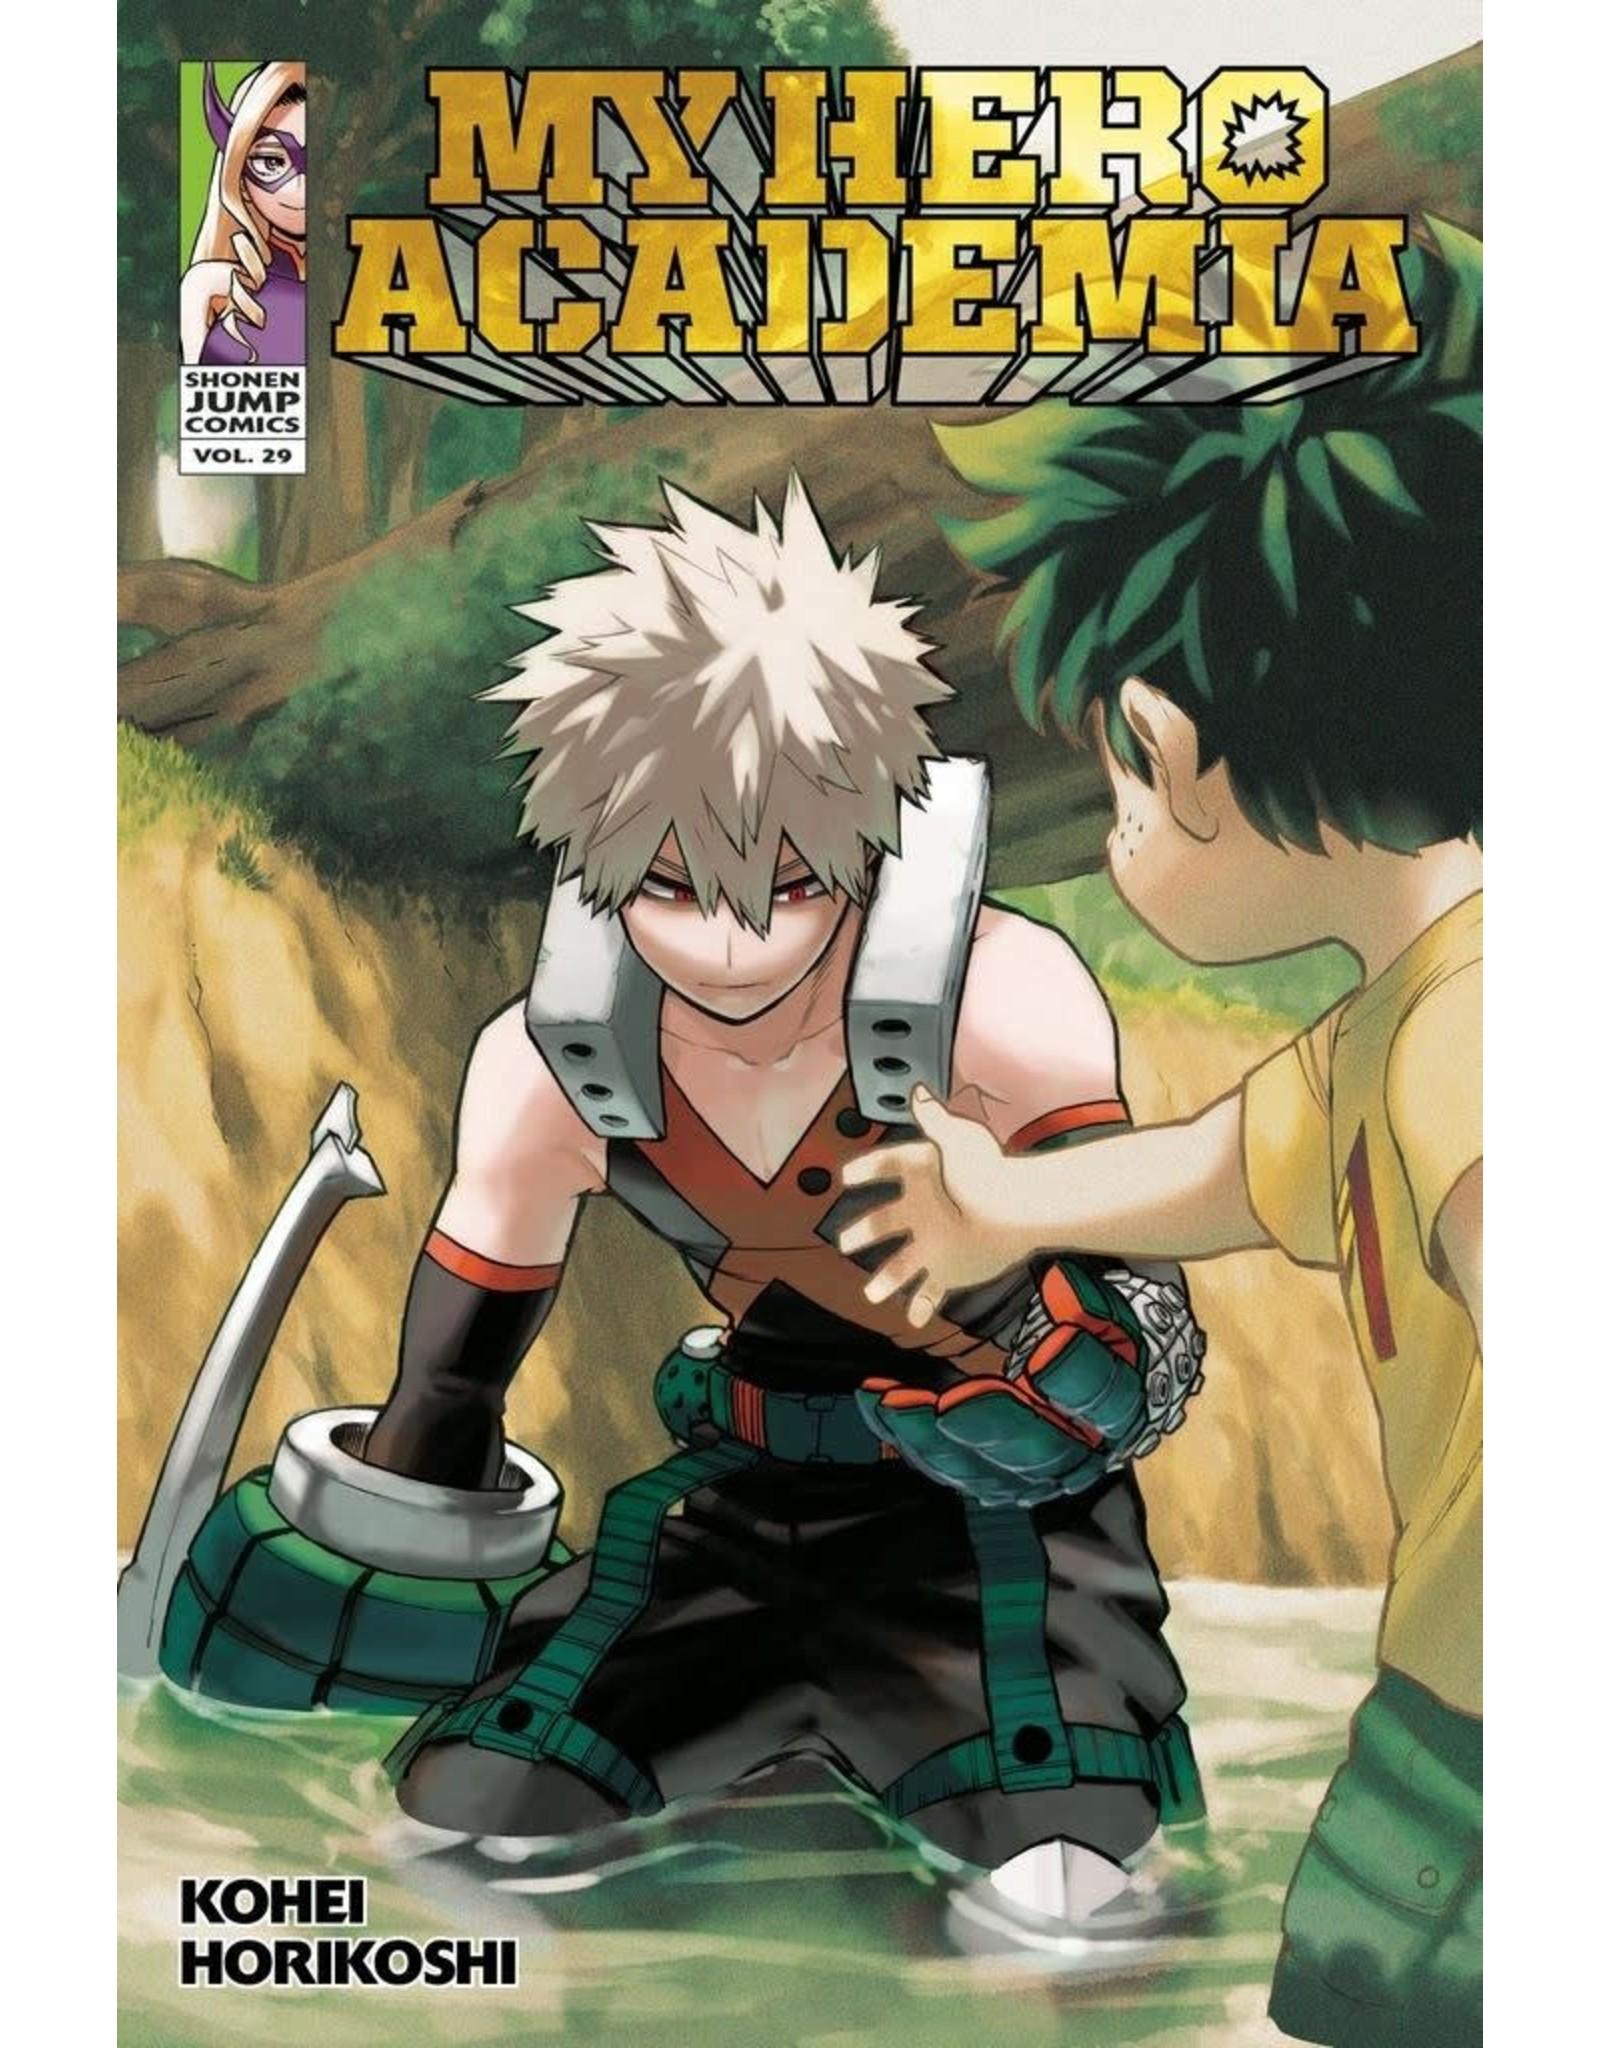 My Hero Academia Volume 29 (Engelstalig) - Manga